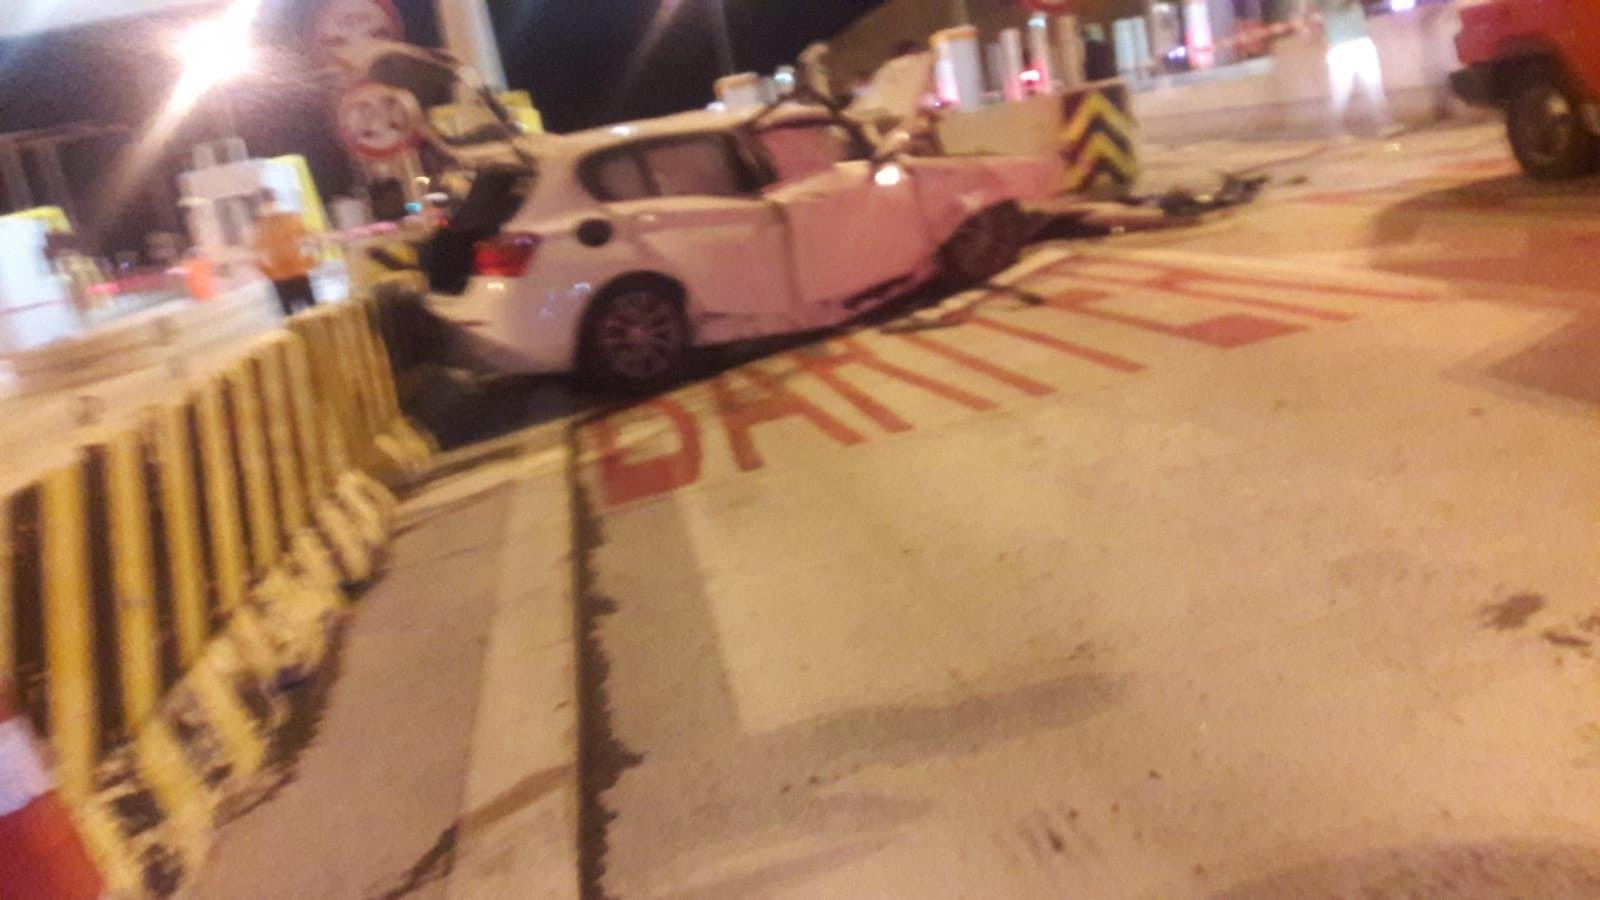 2021/09/izmir-hakimi-kazada-hayatini-kaybetti-20210918AW42-2.jpg